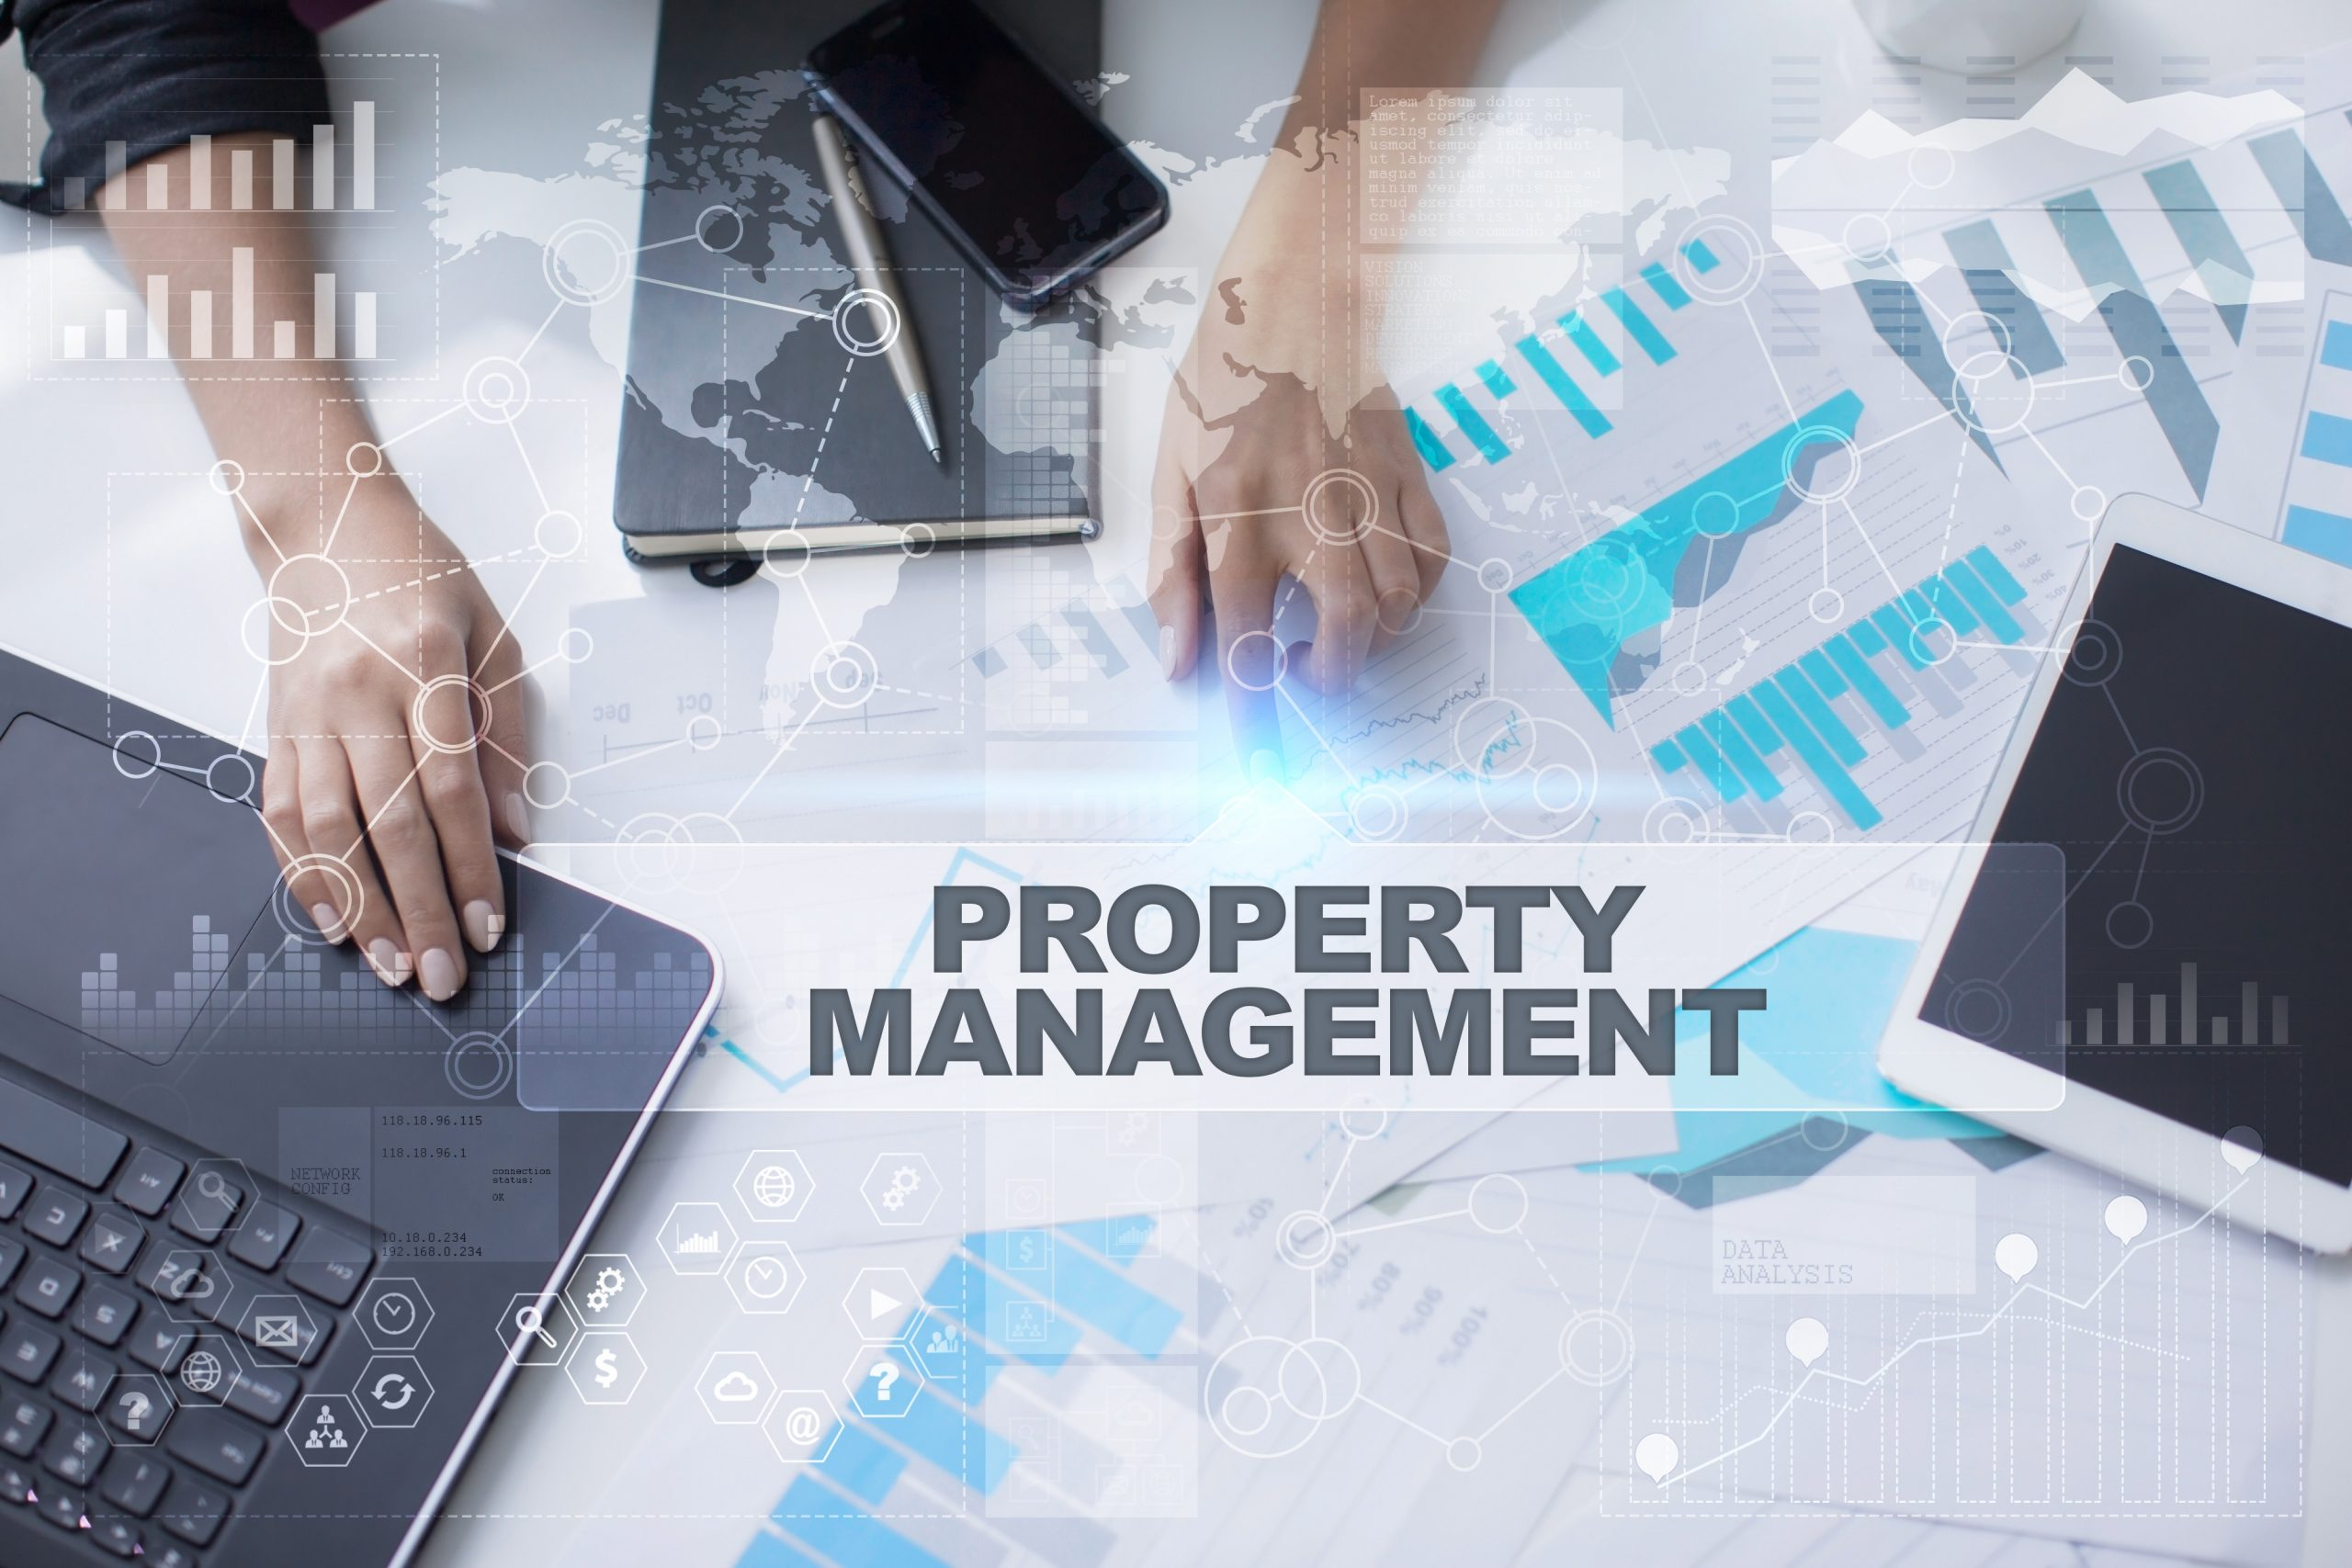 SPL Property Management